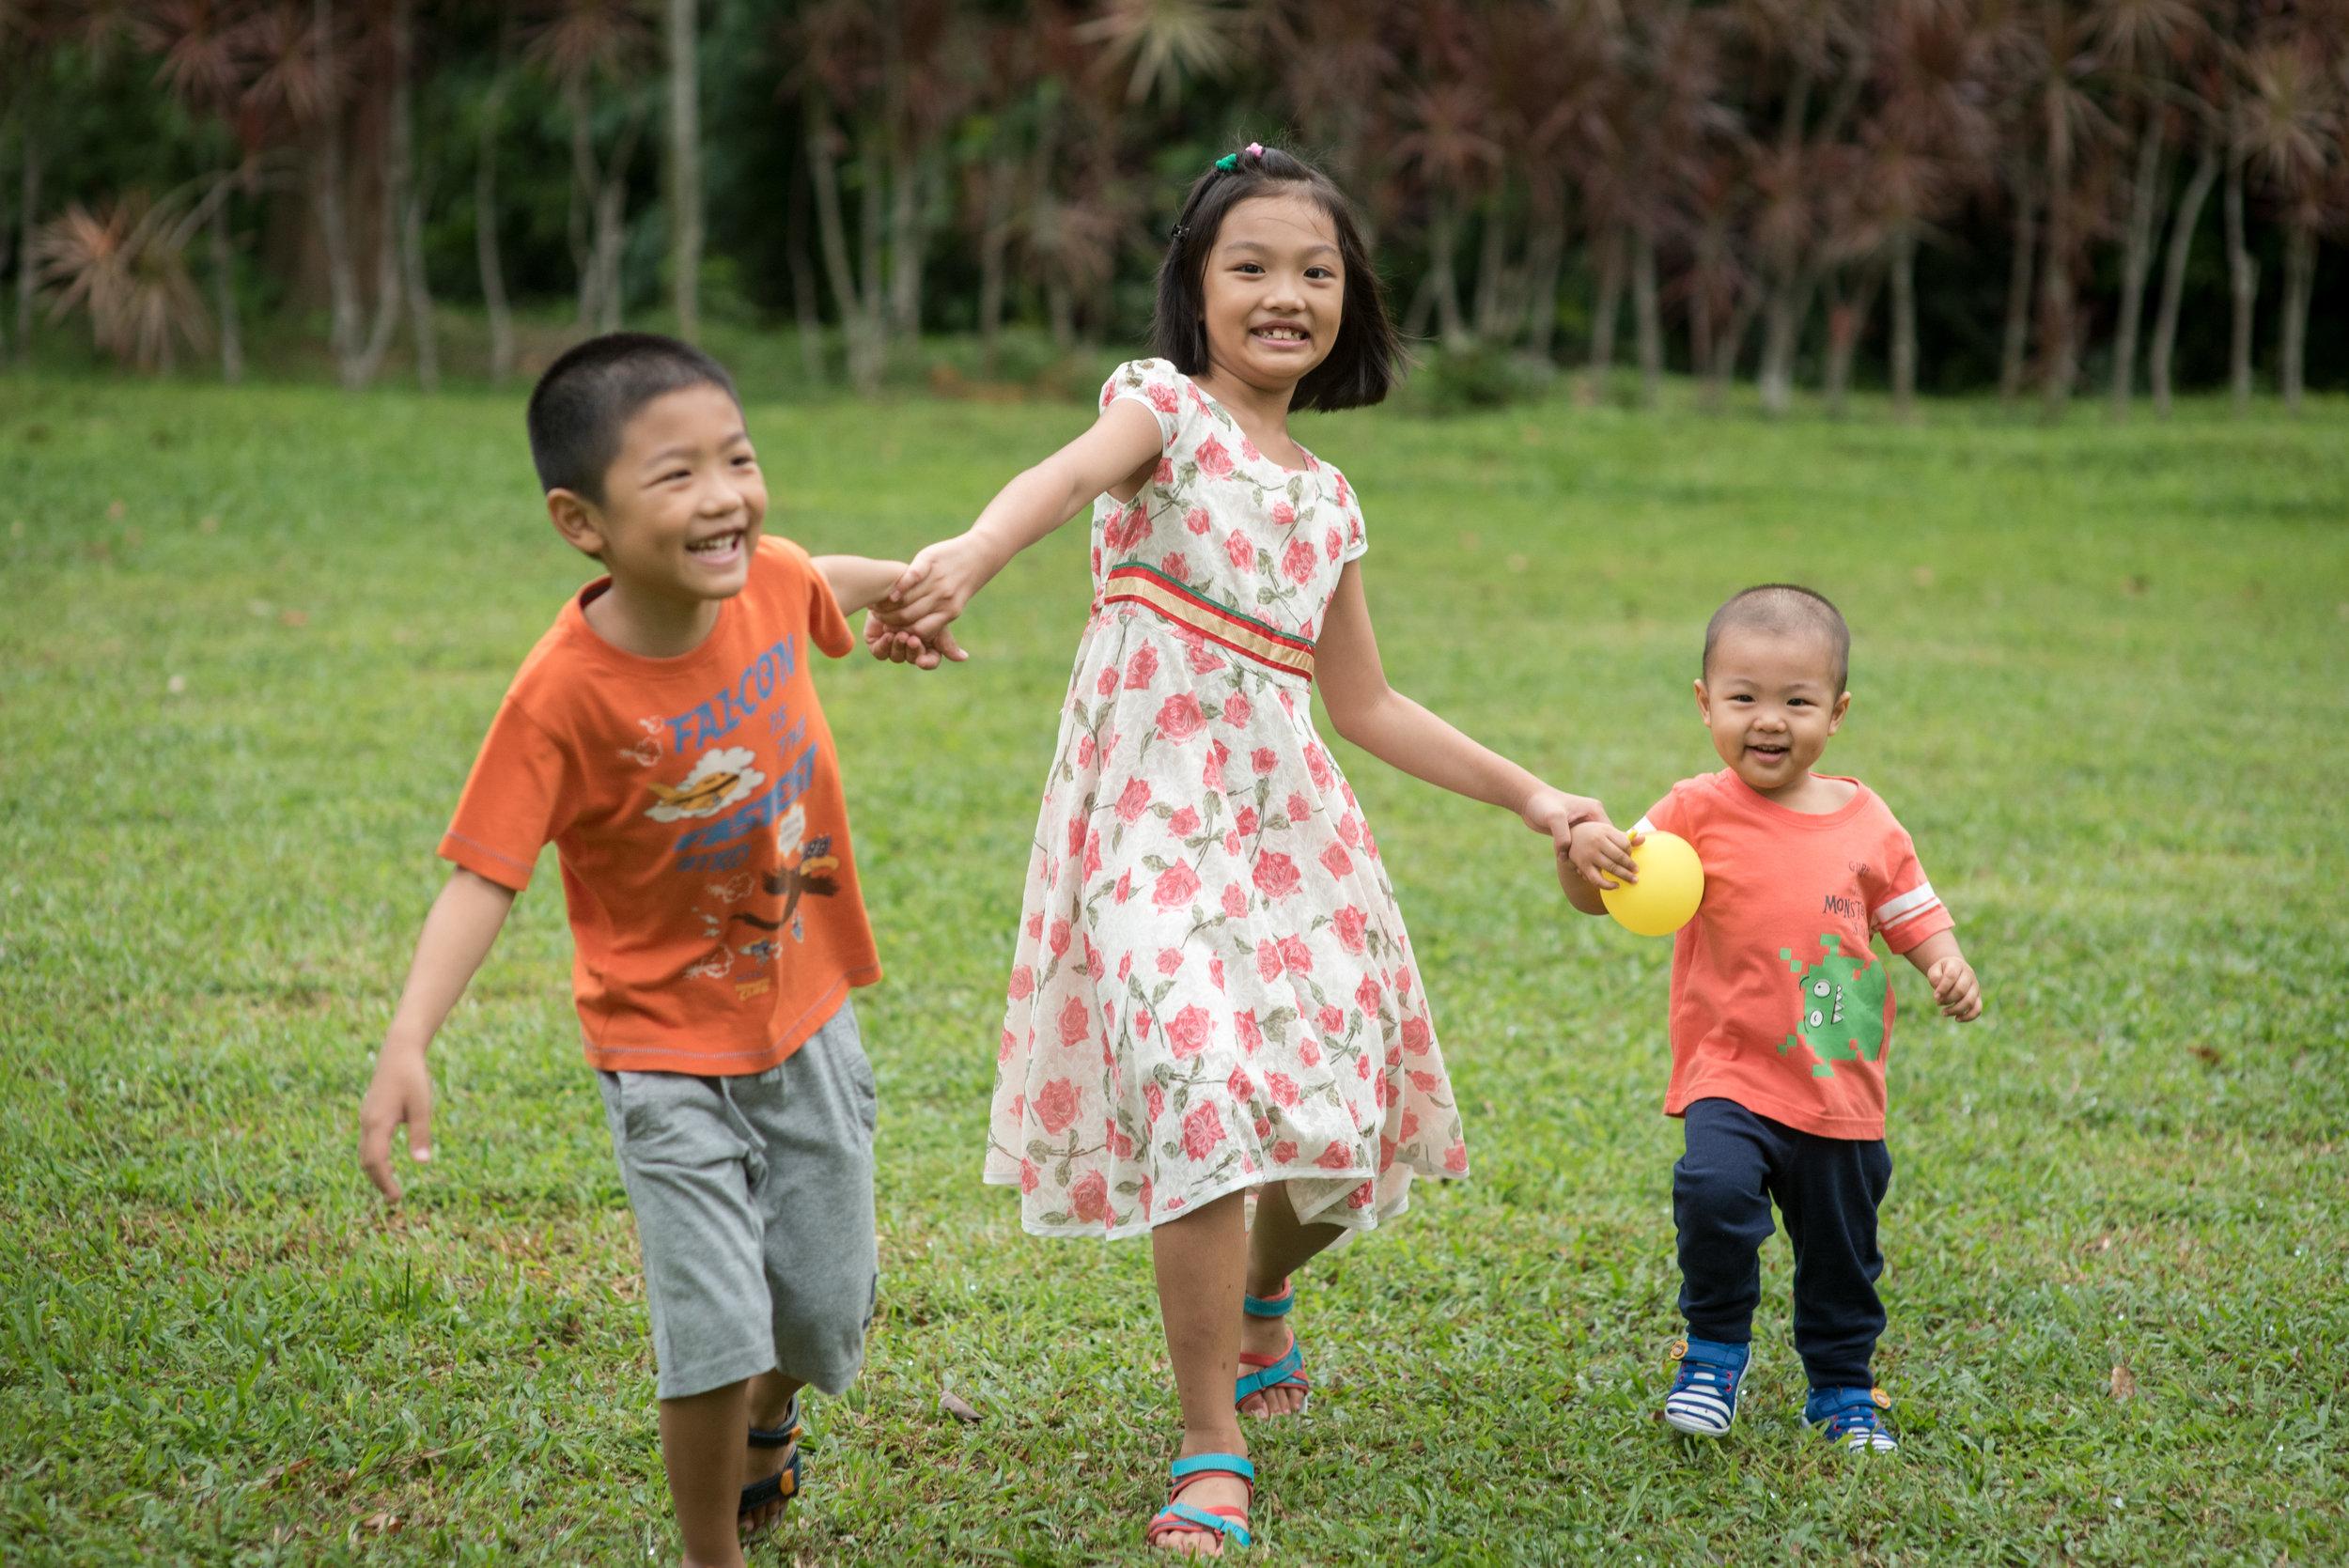 ang-mo-kio-park-family-06